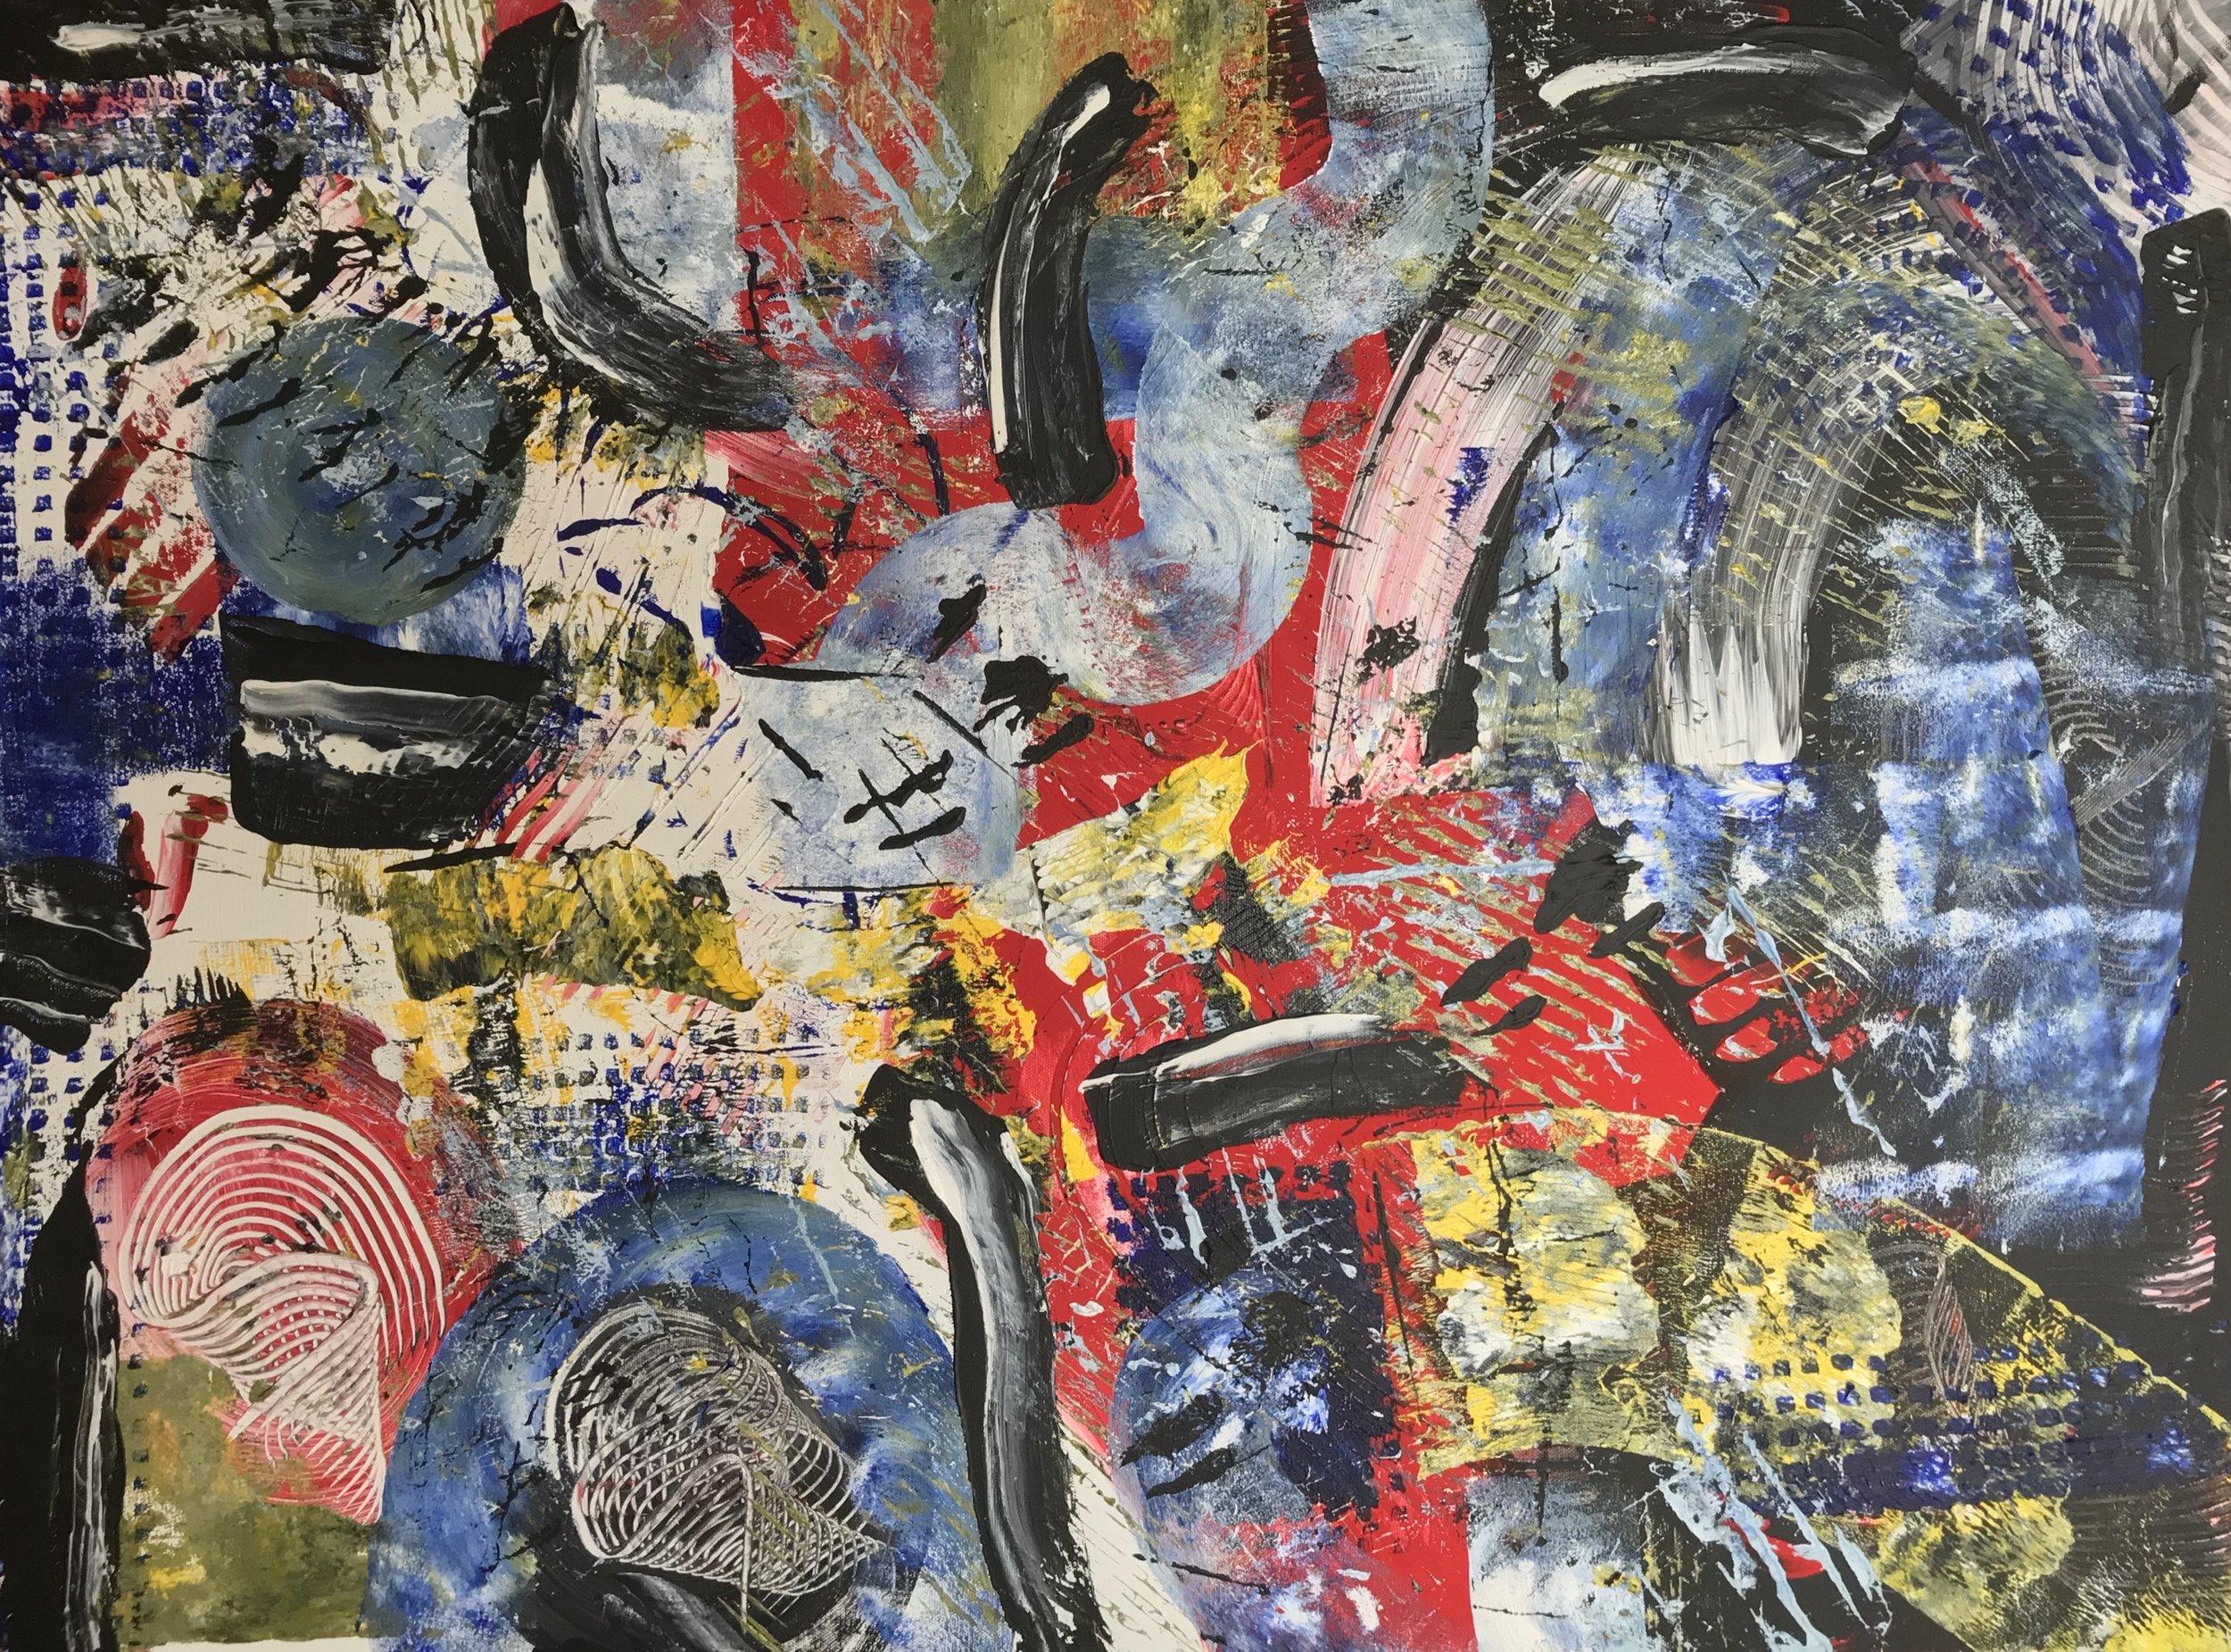 Sheila Cahill - _Thnking of JJ_ - 30 x 40 - Acrylic on canvas - 2018 - $2000.JPG